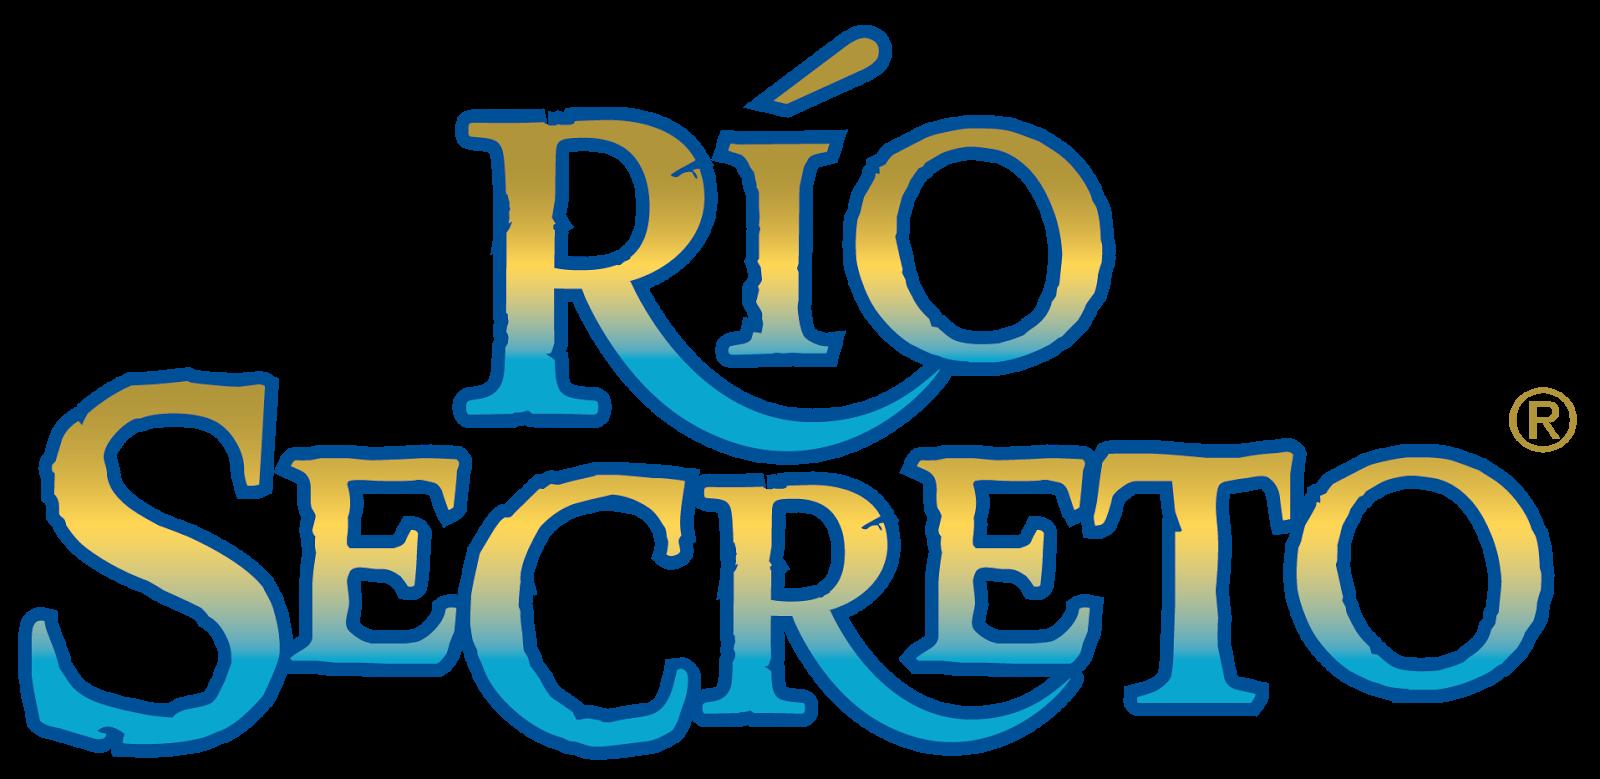 Rio Secreto